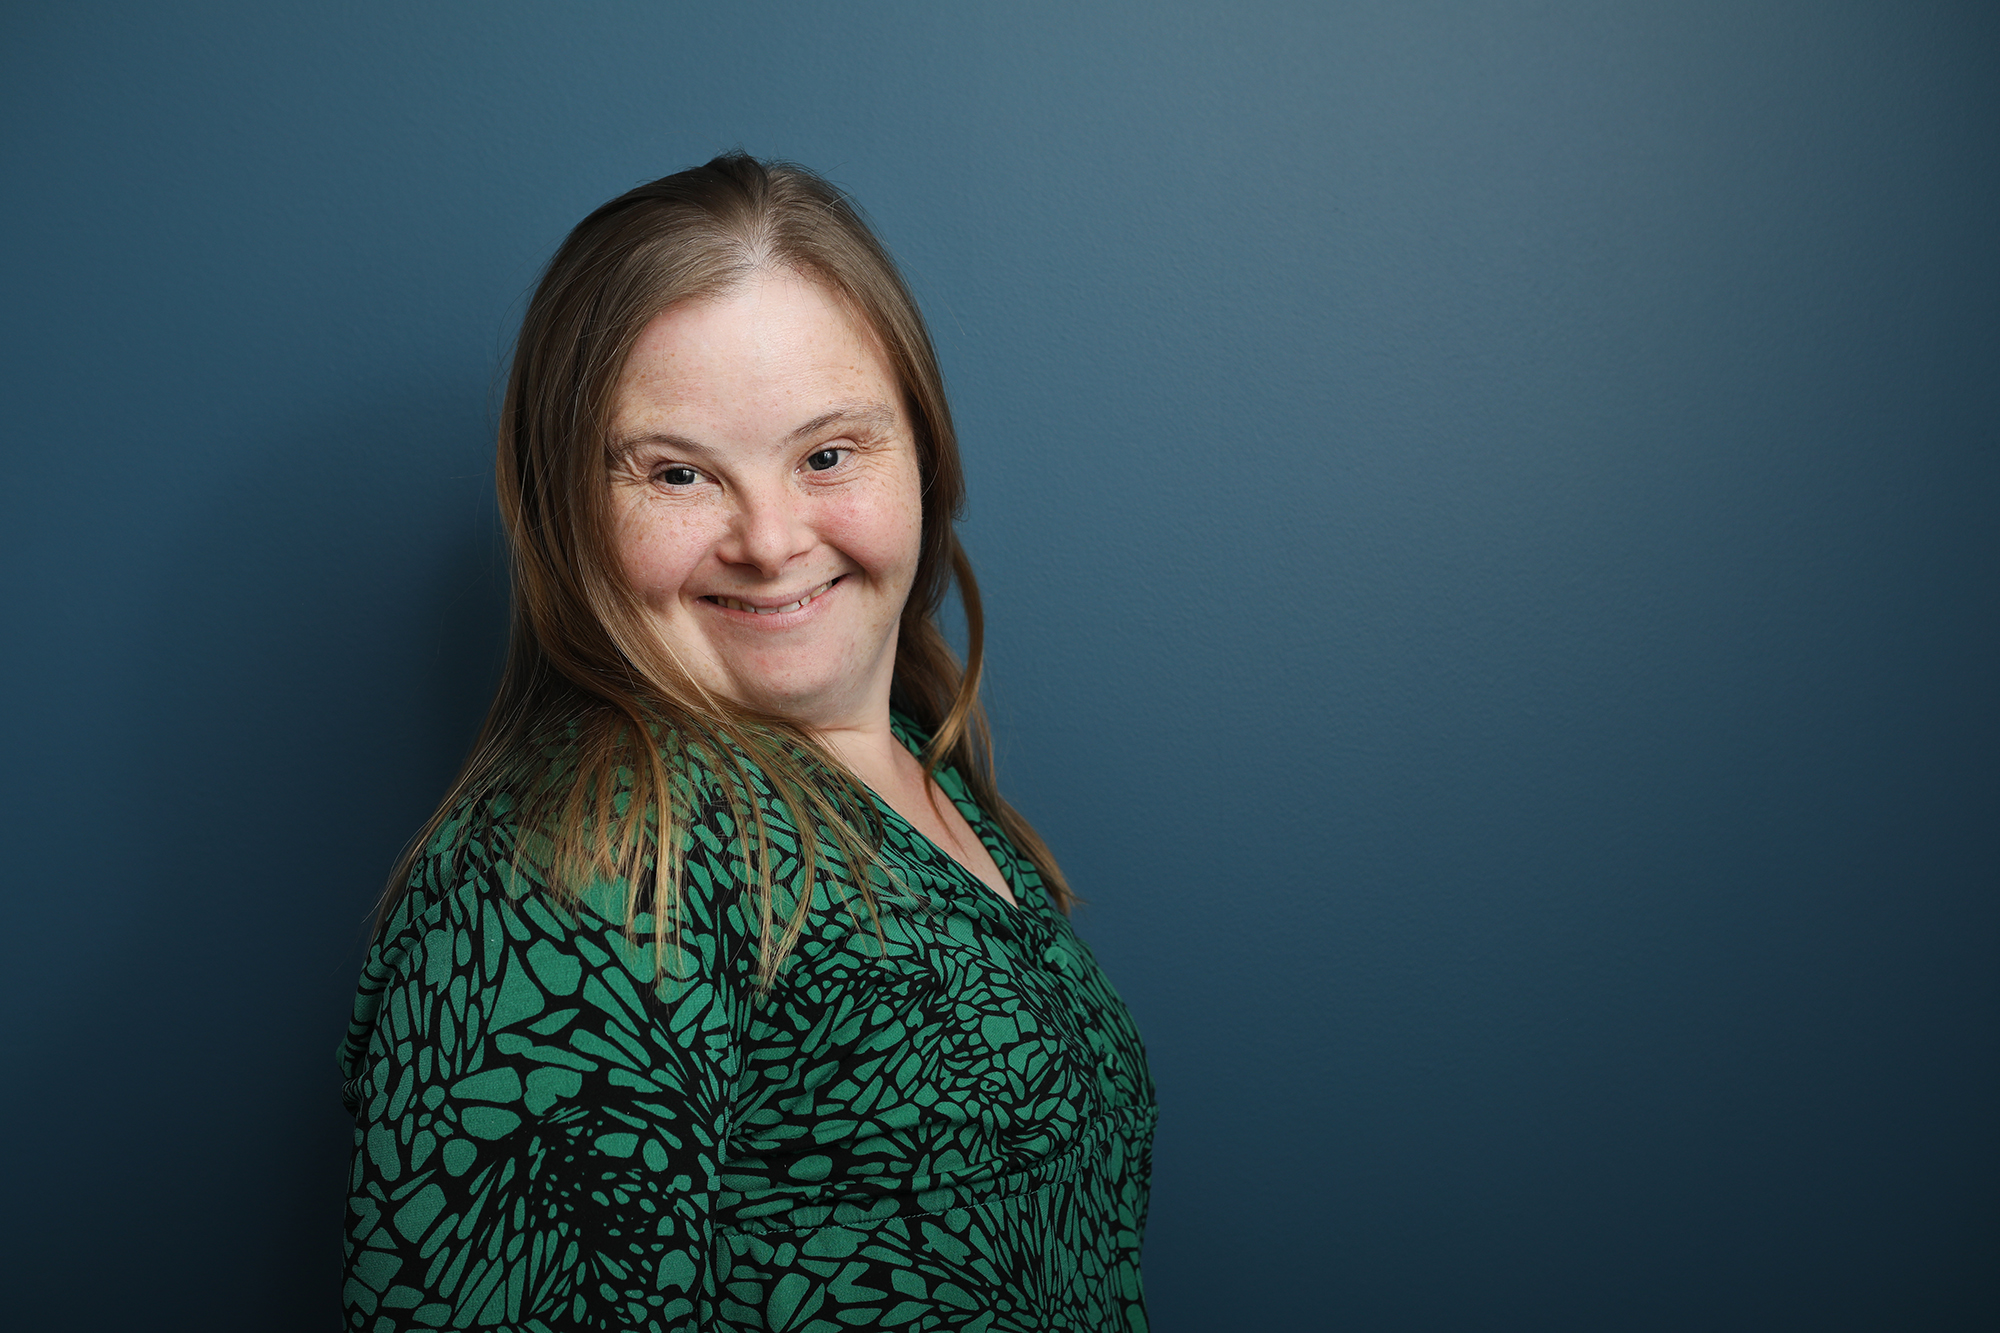 Tara Elliffe at the Down Syndrome Australia Leadership Training Session in Parramatta.